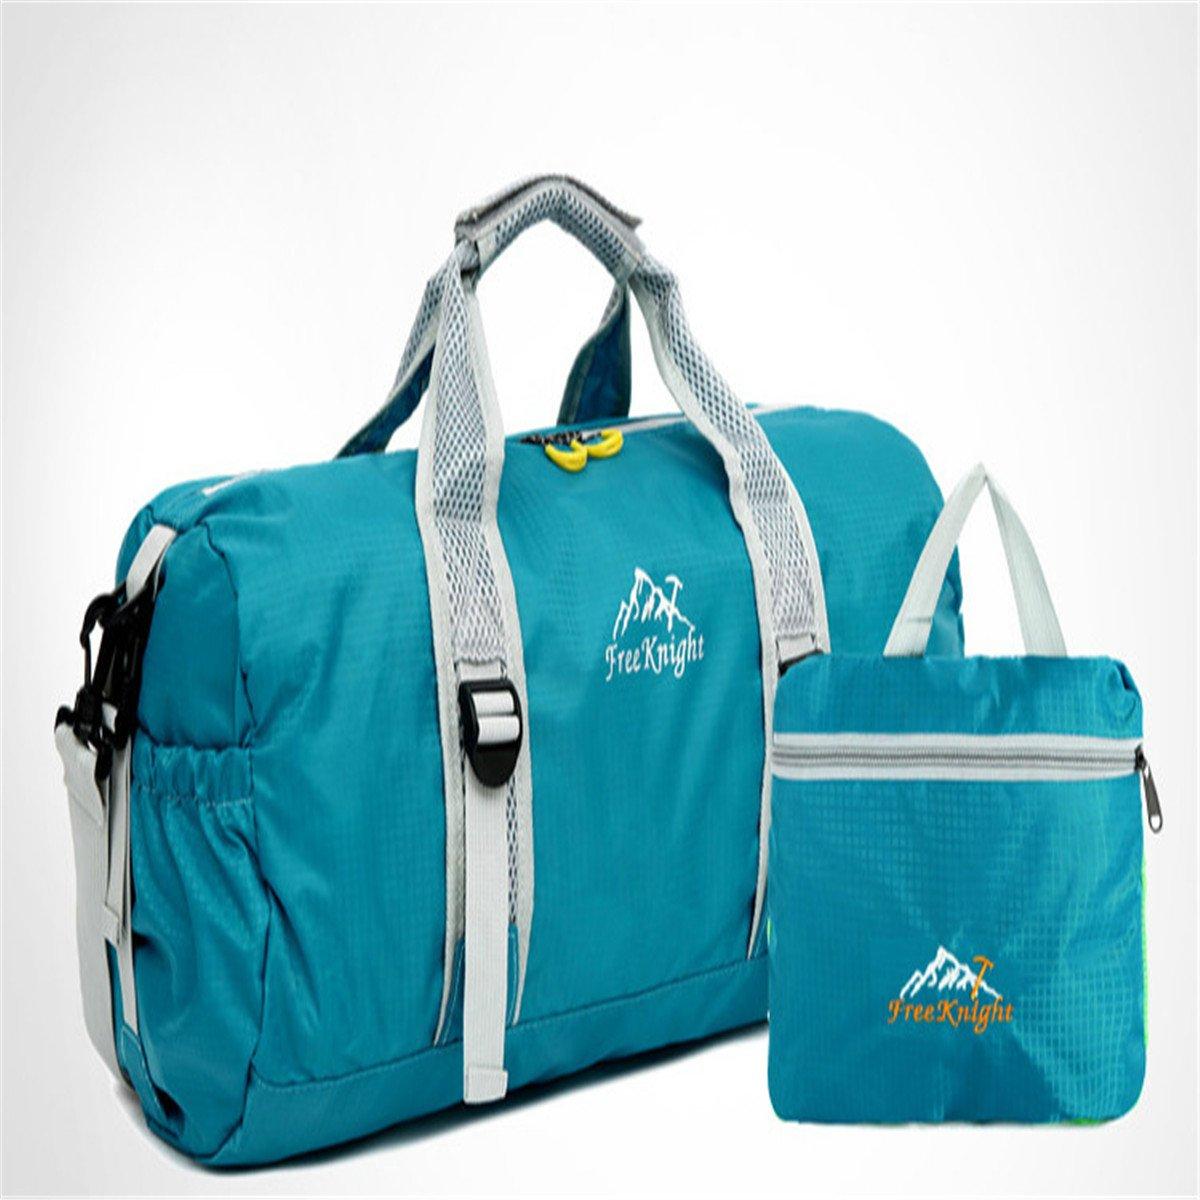 Unisex Travel Duffel Bag Waterproof Fashion Lightweight Large Capacity Portable Luggage Bag Canadian American Flag